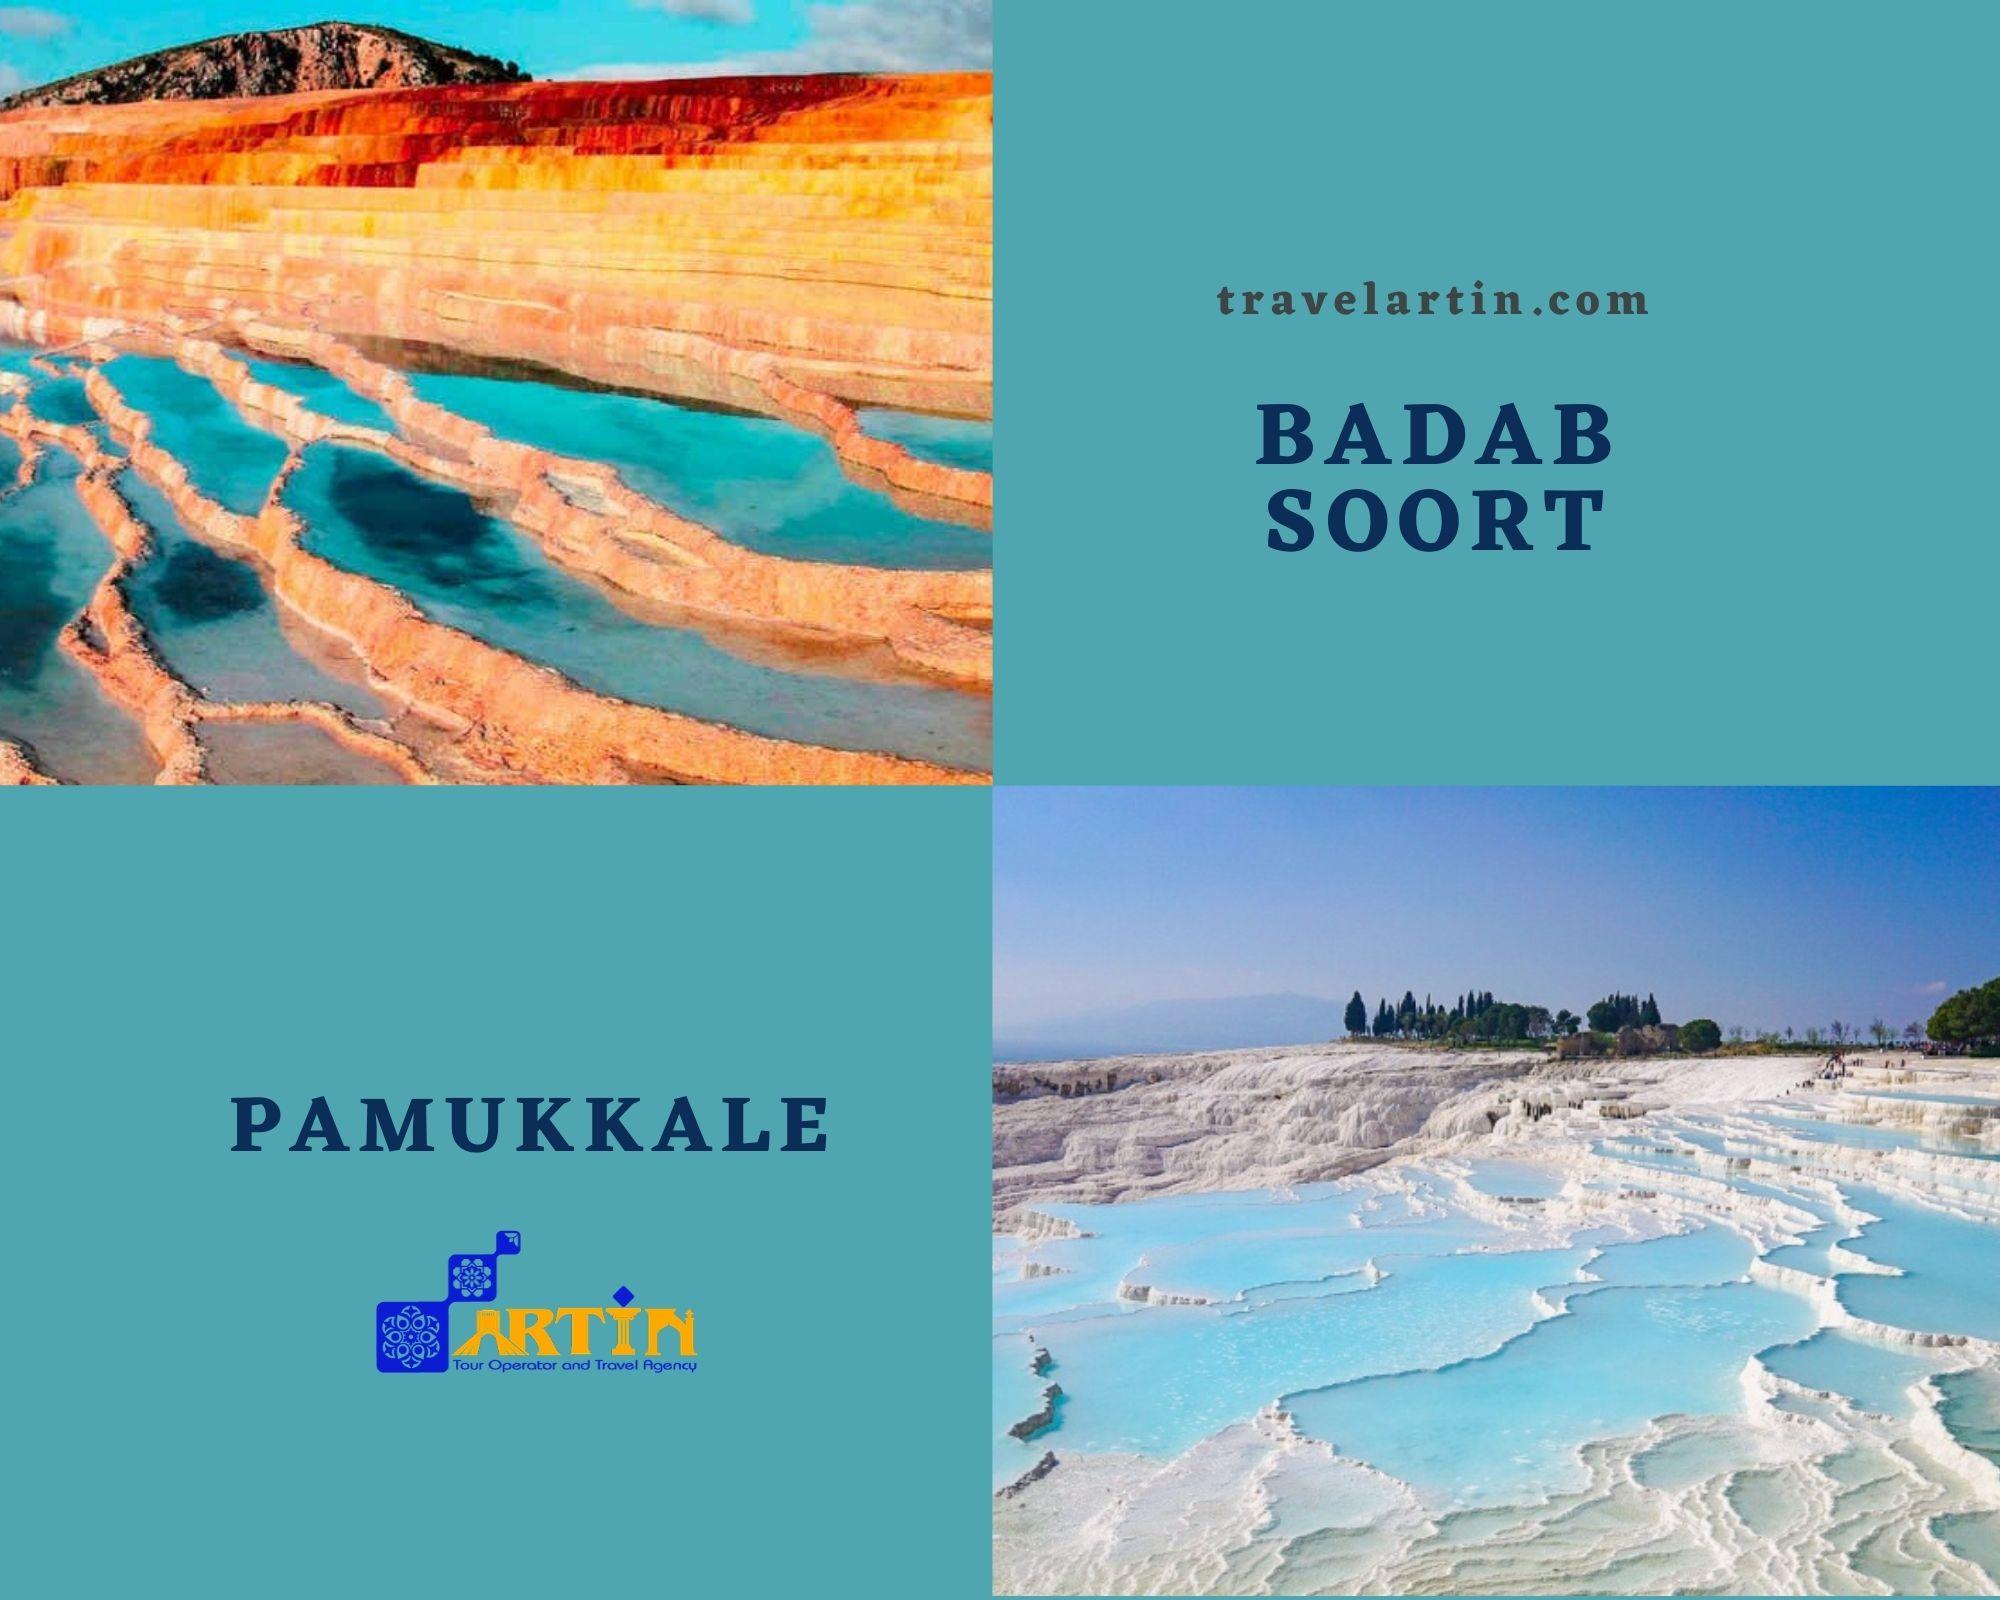 travel to Iran from turkey badab soort vs Pamukkale